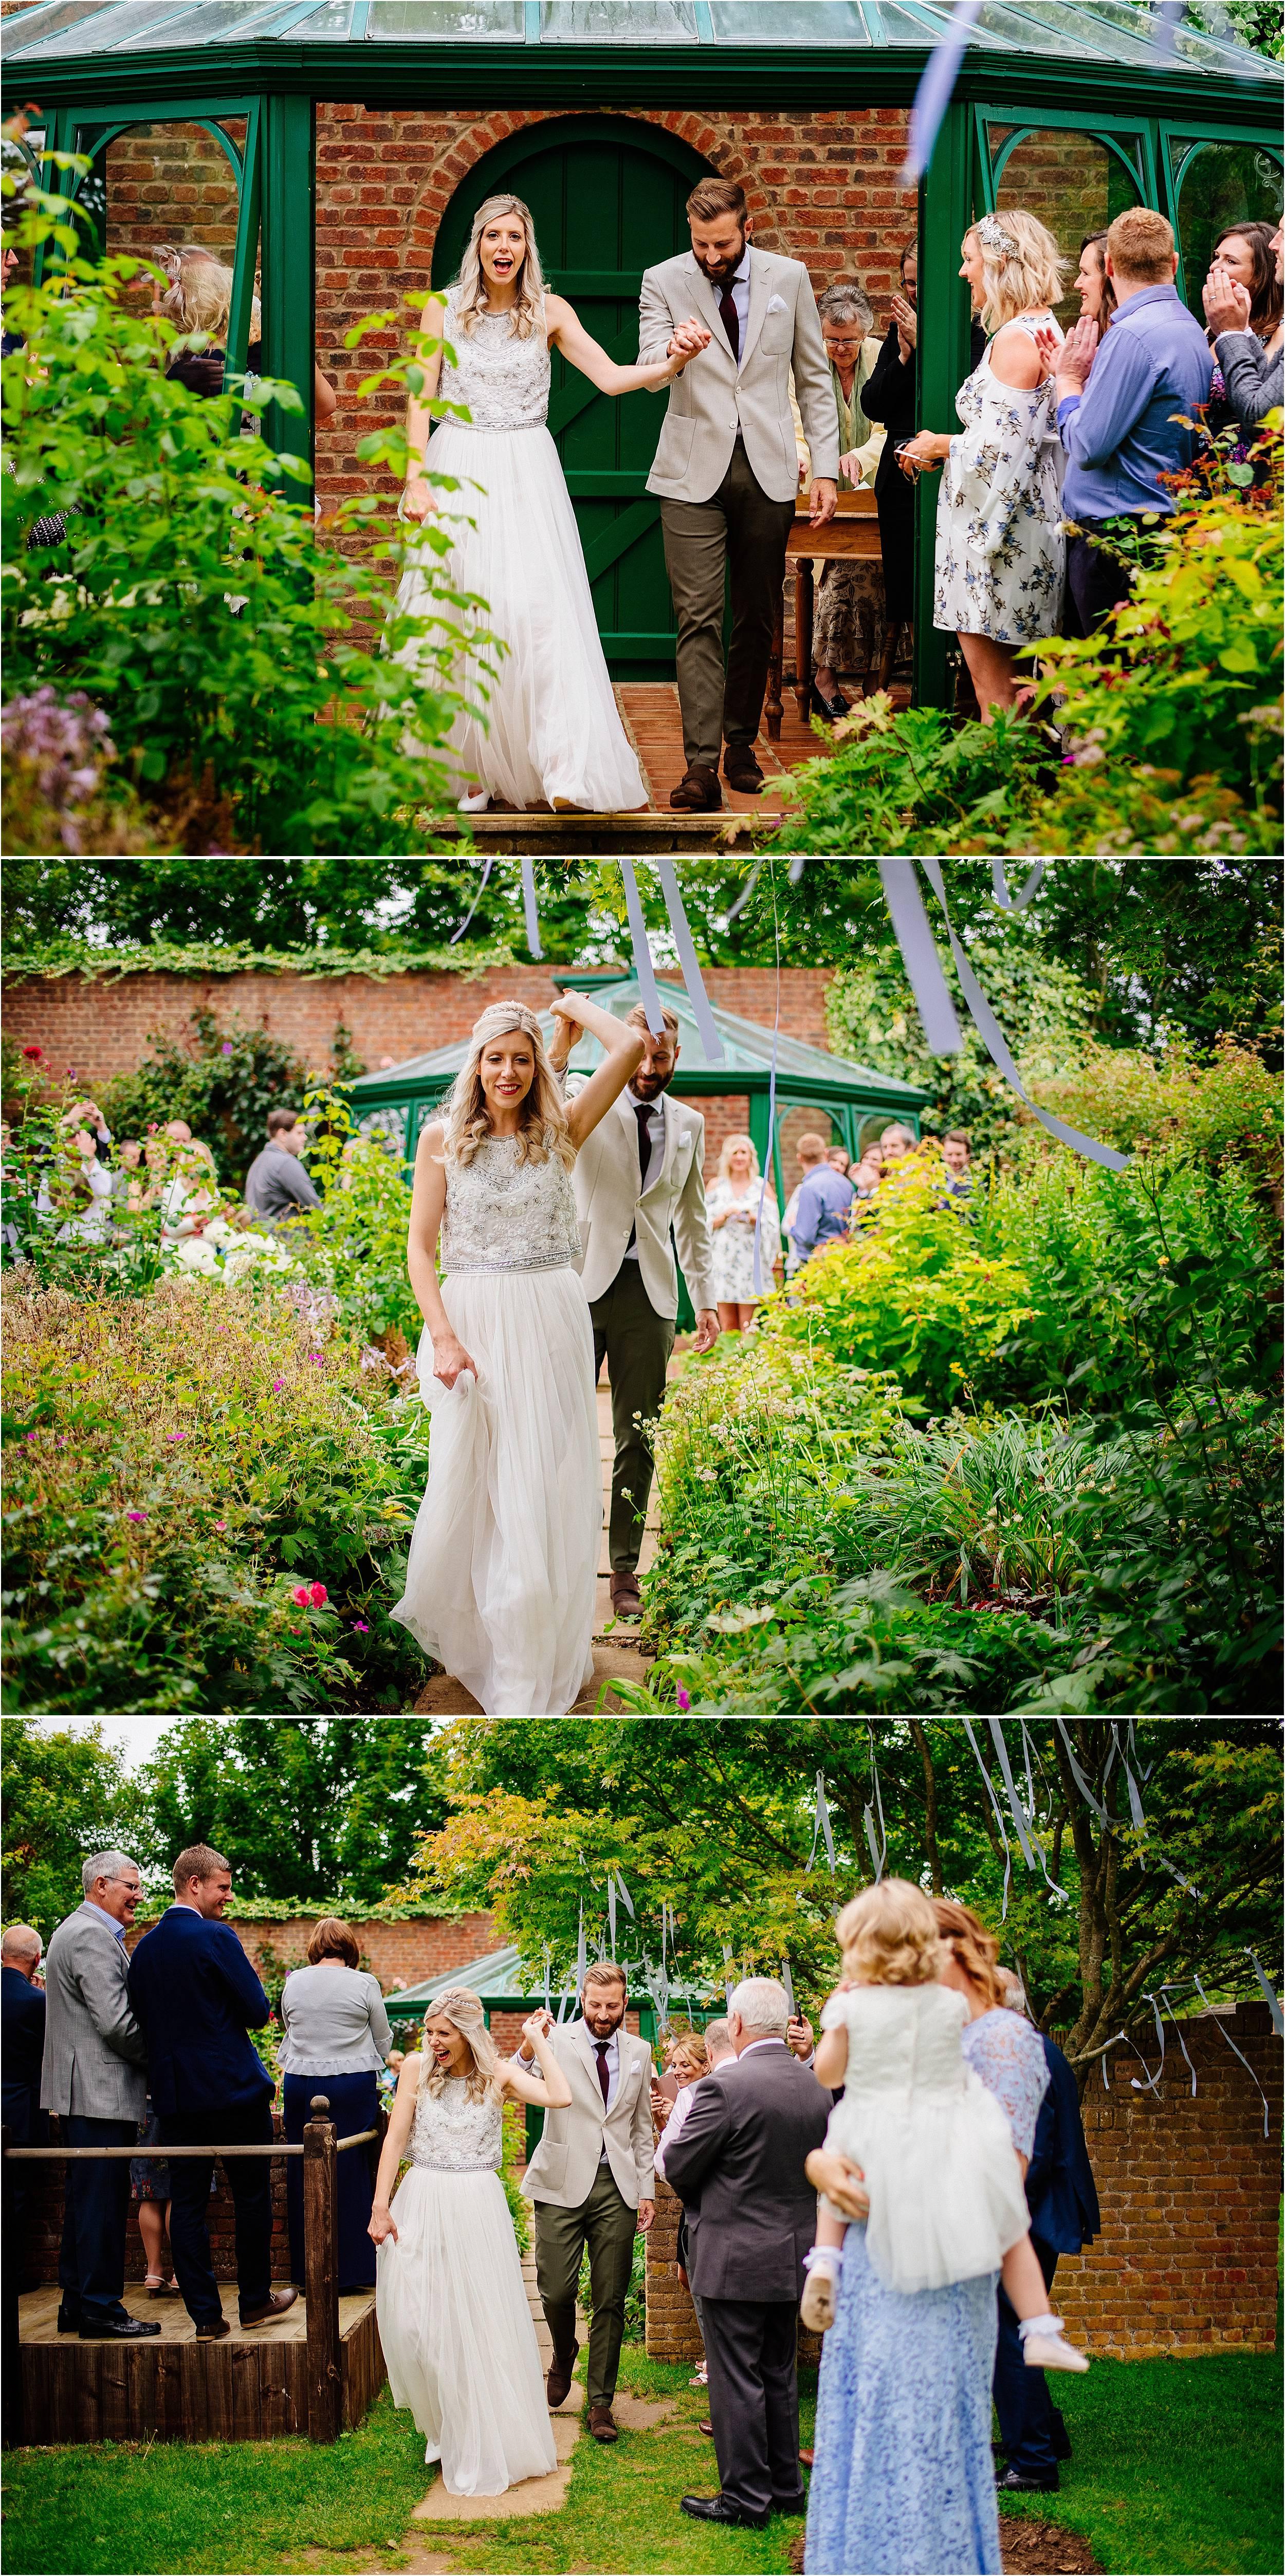 Barnsdale Gardens Wedding Photographer_0032.jpg